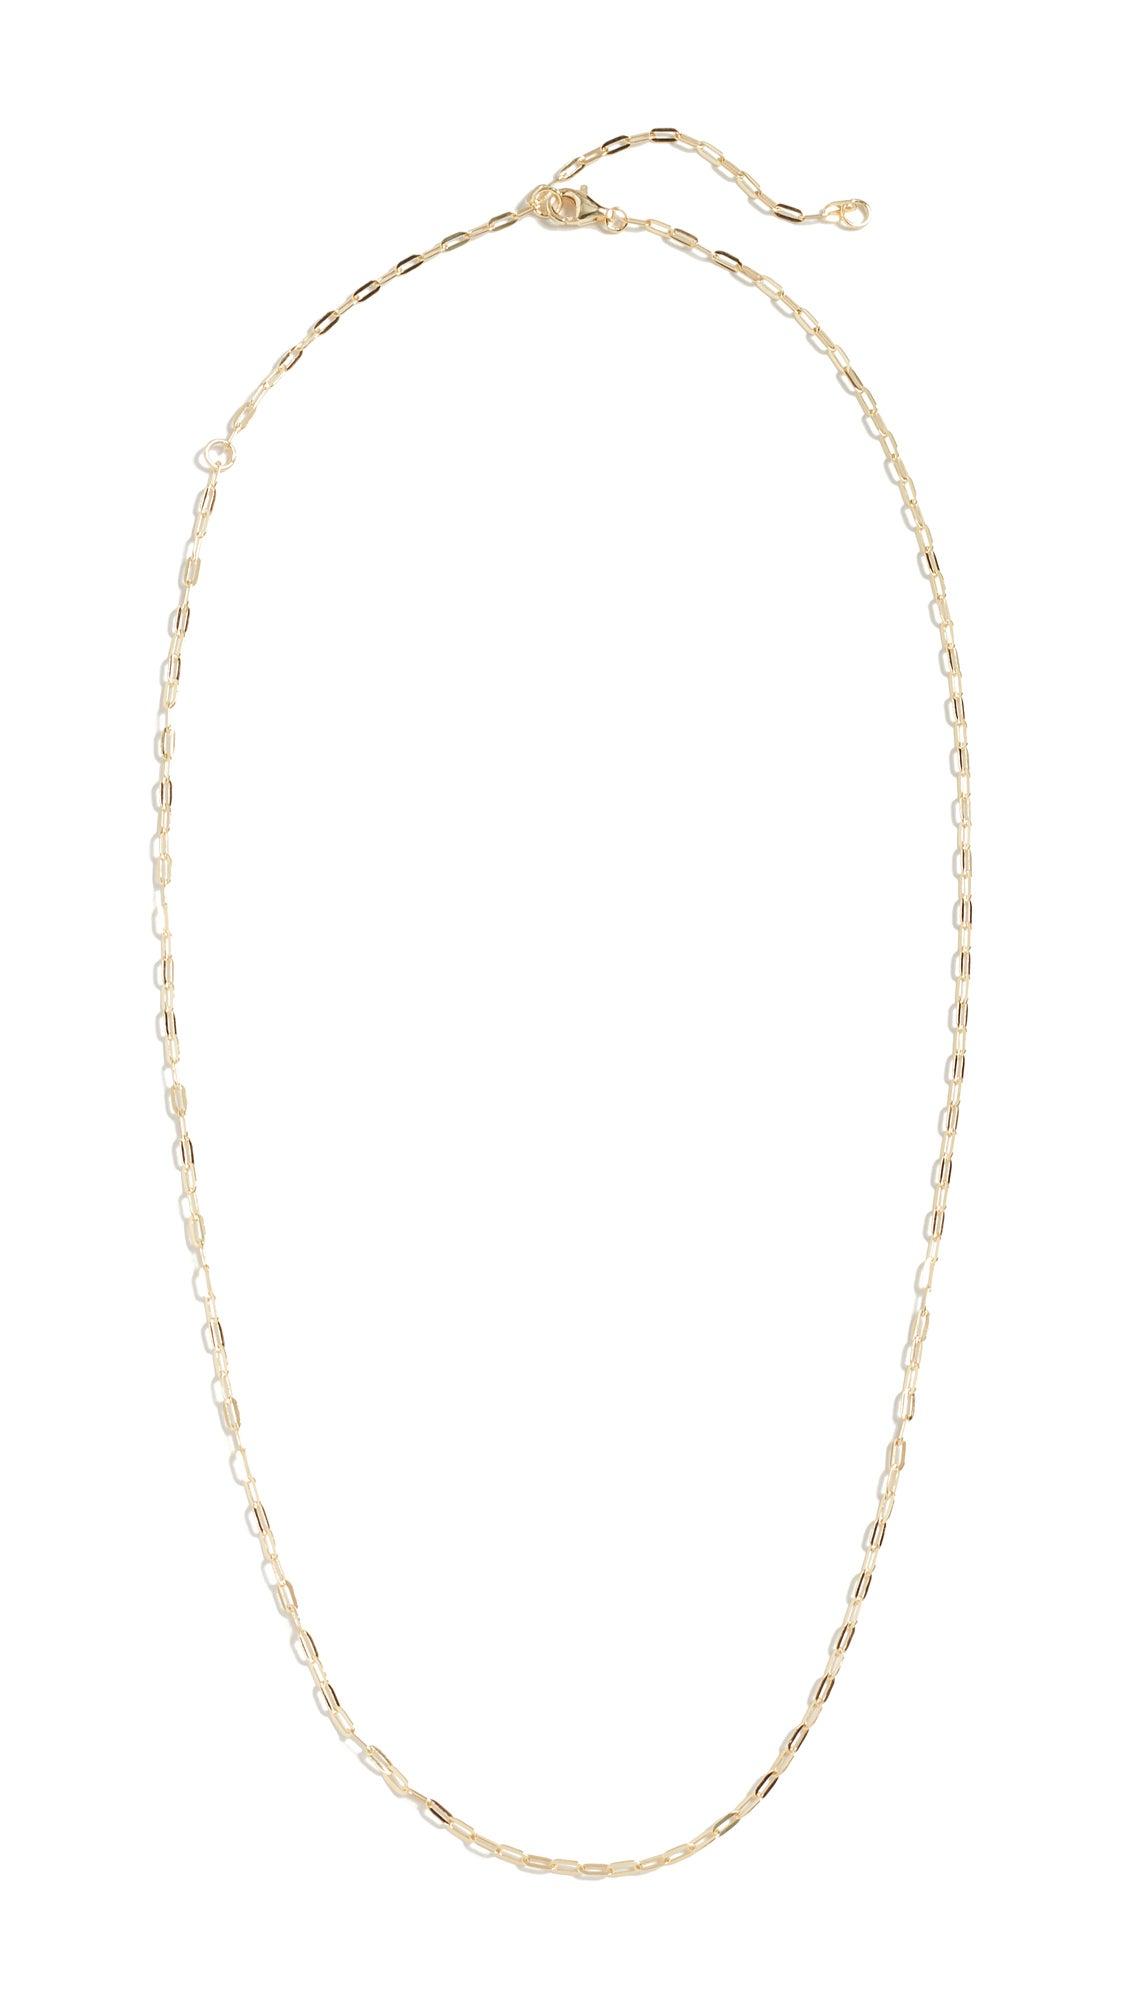 Miansai 1.7MM Cable Chain Necklace